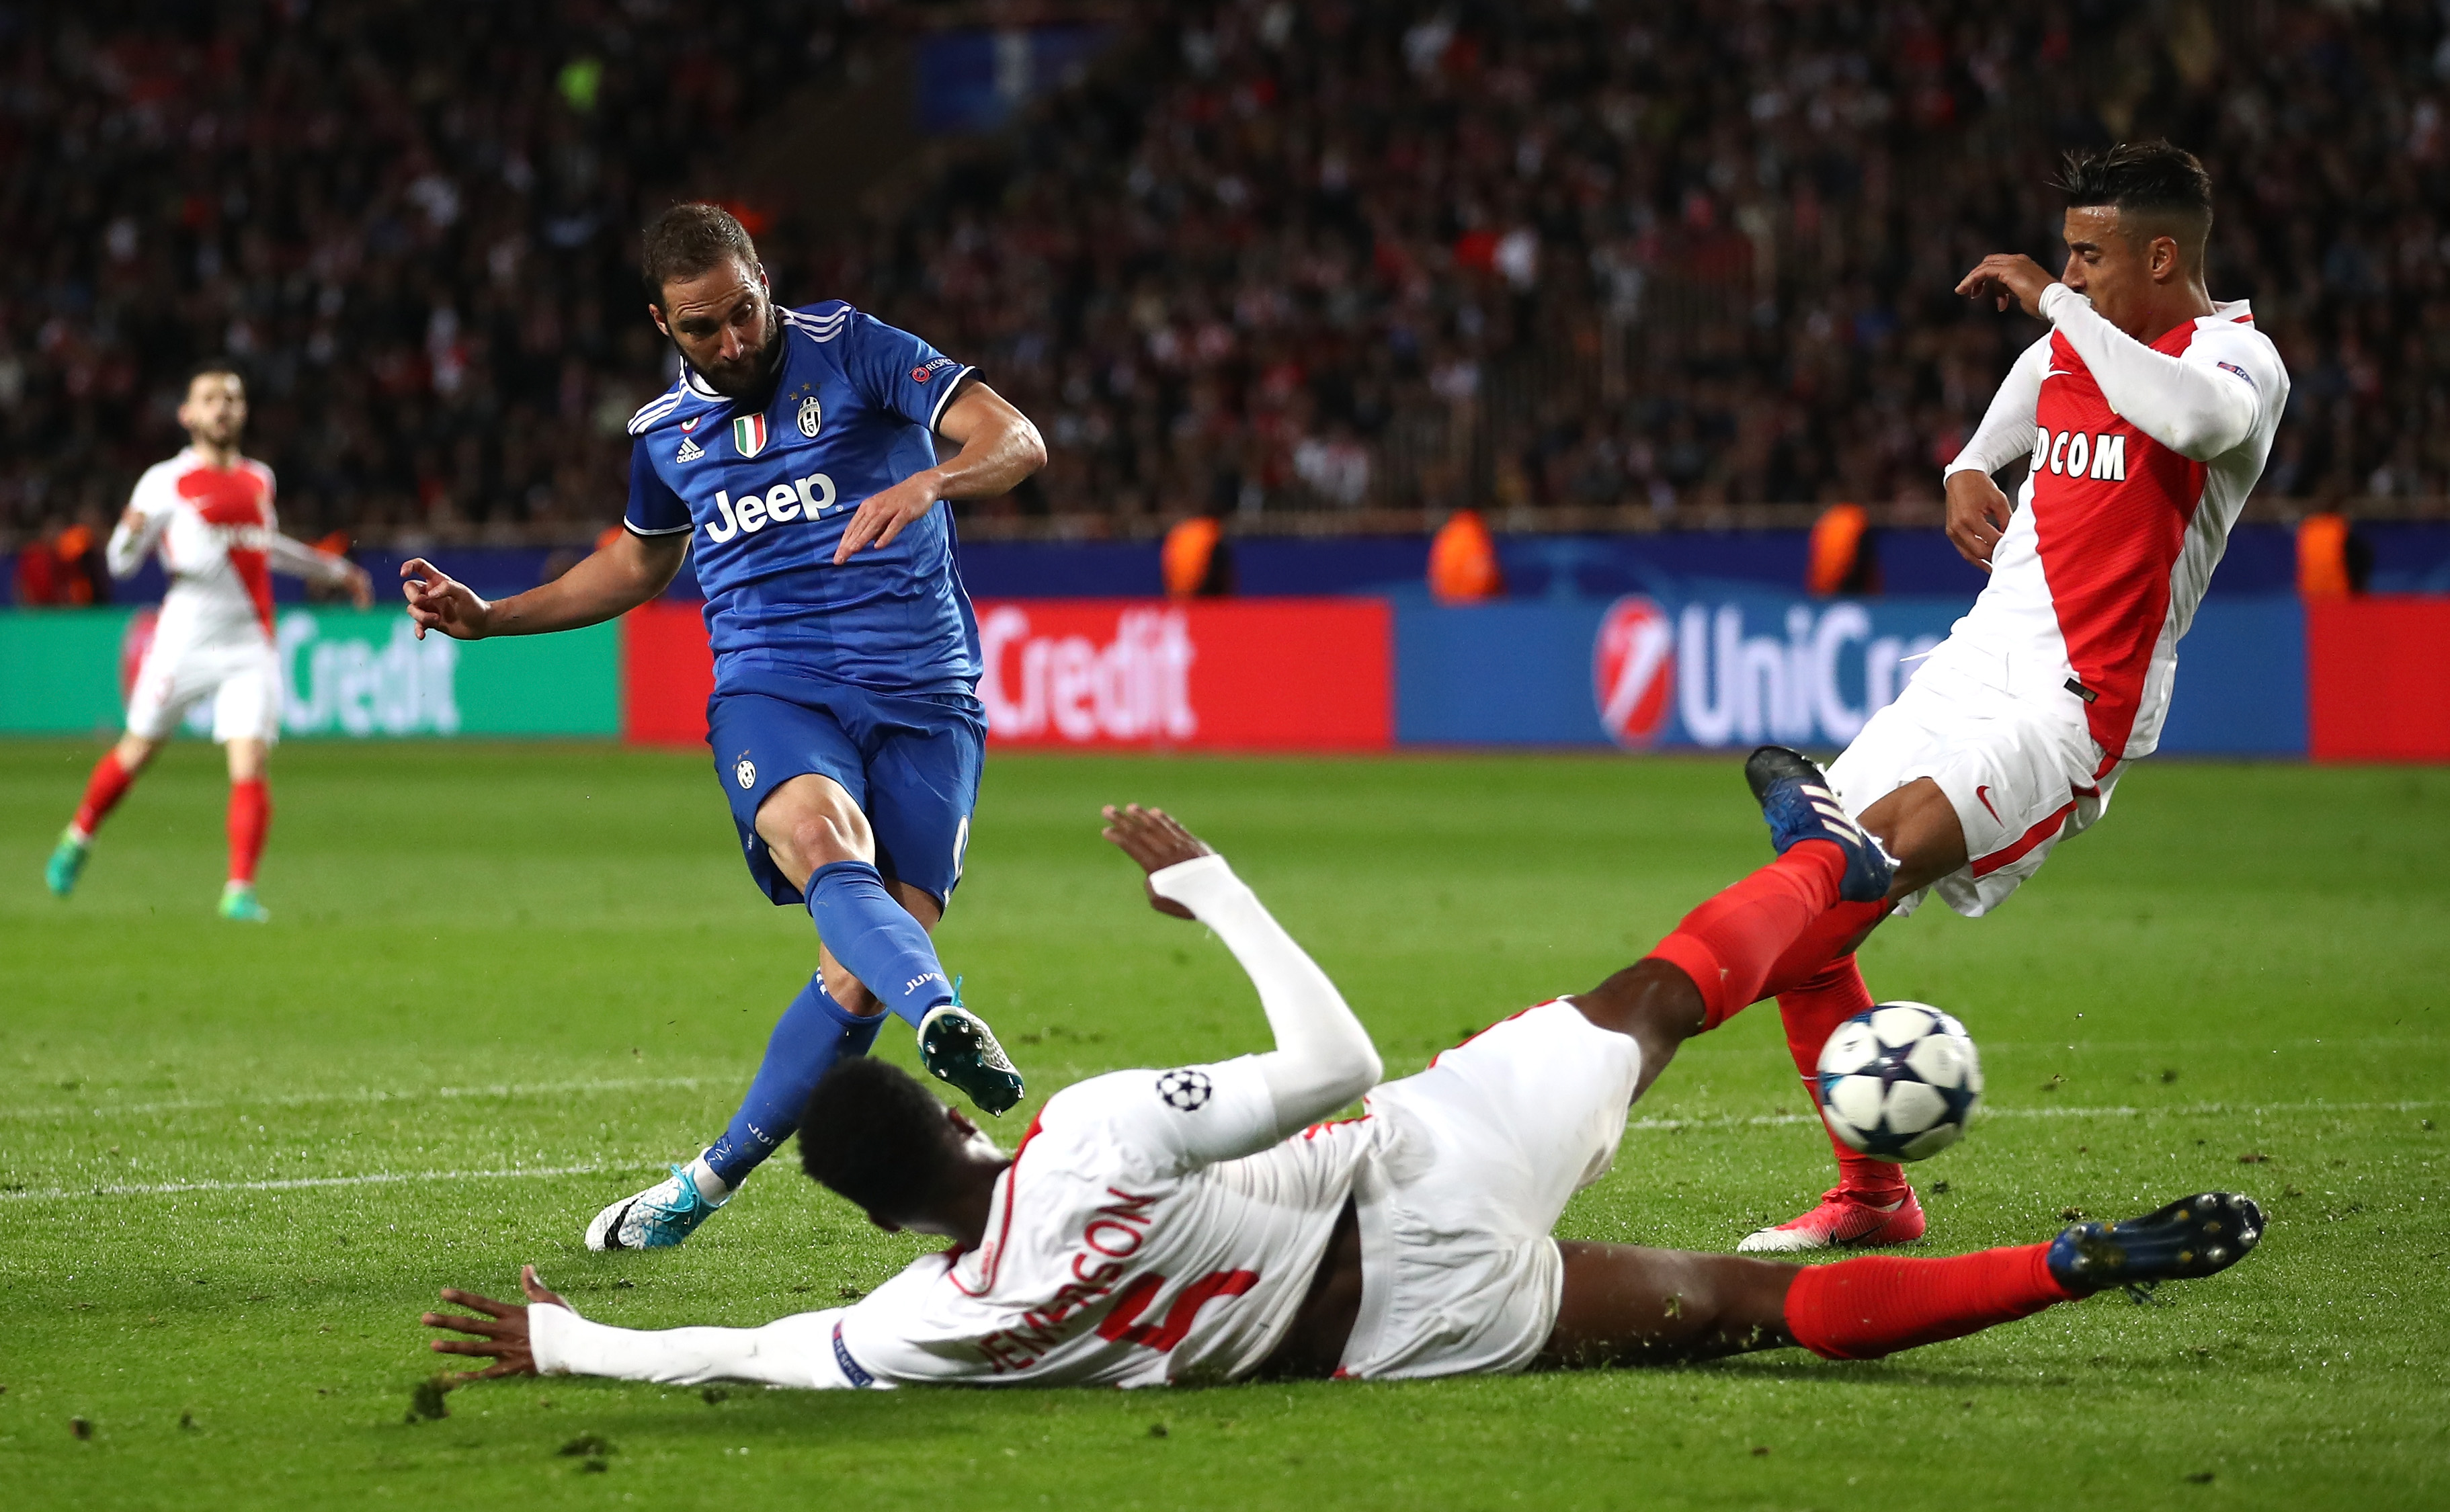 Juventus vs AS Monaco